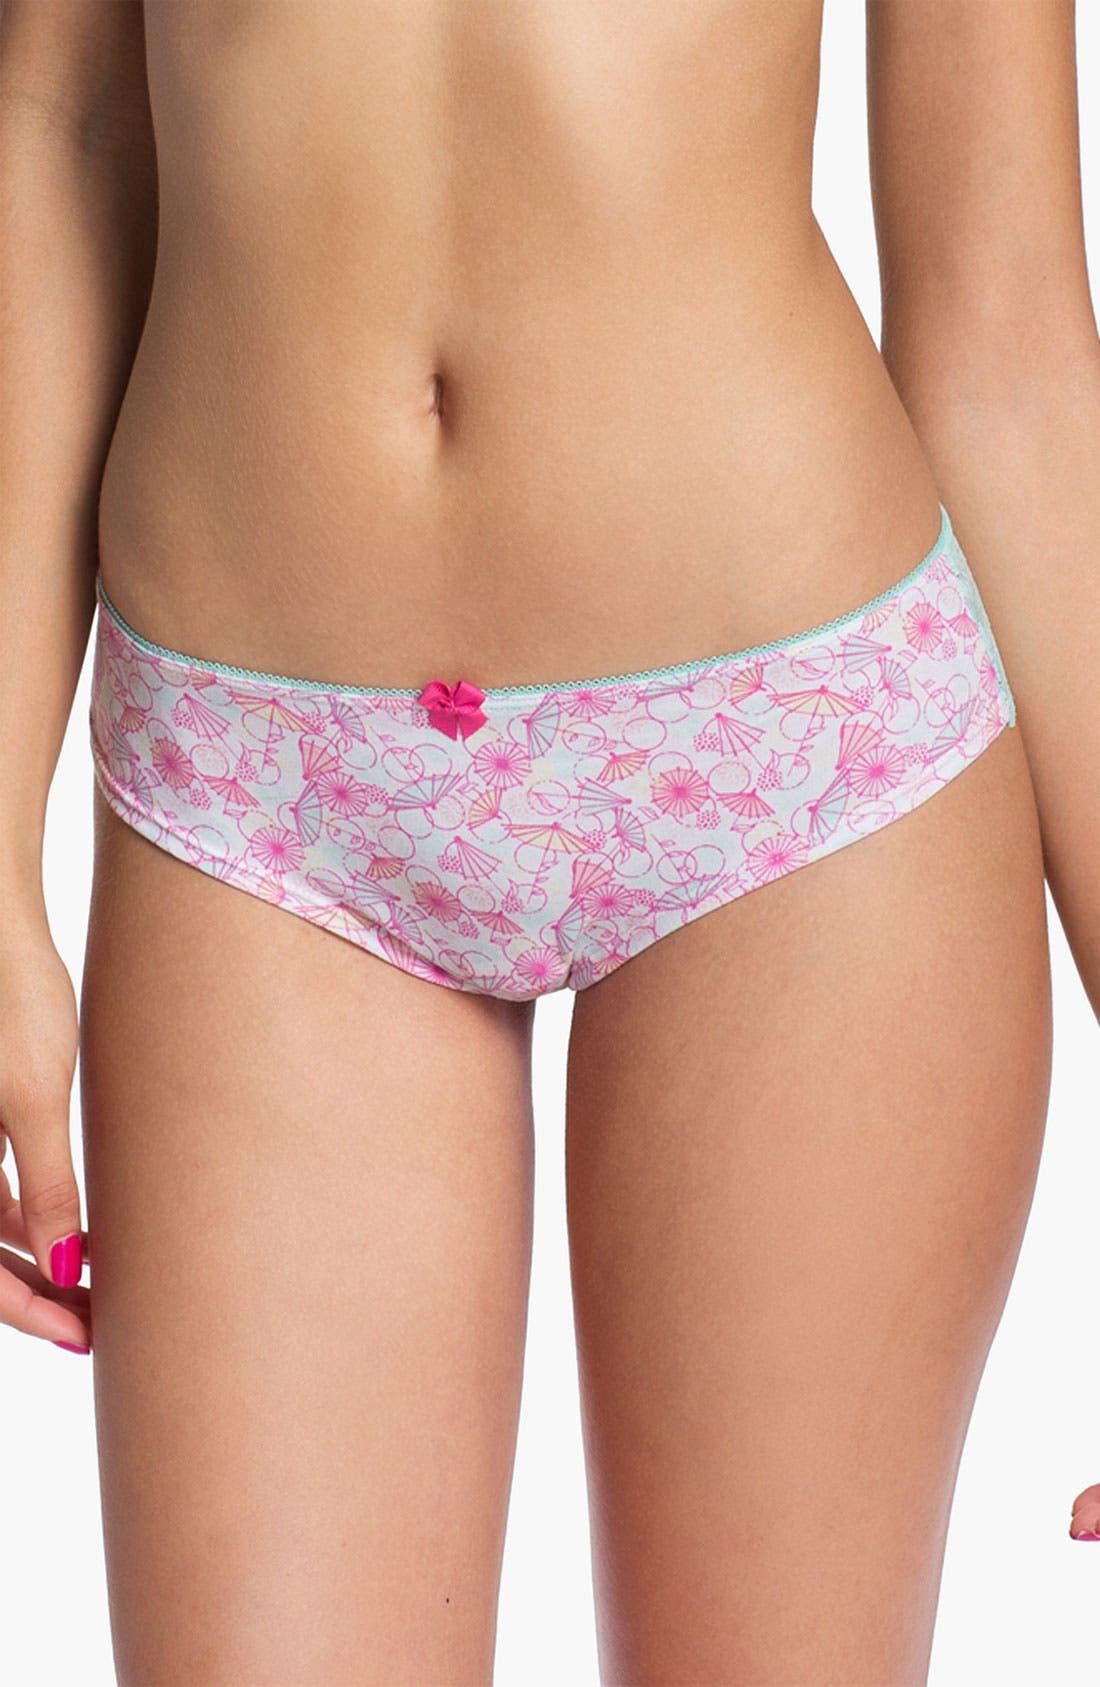 Alternate Image 1 Selected - BP. Undercover Lace Back Cheeky Bikini